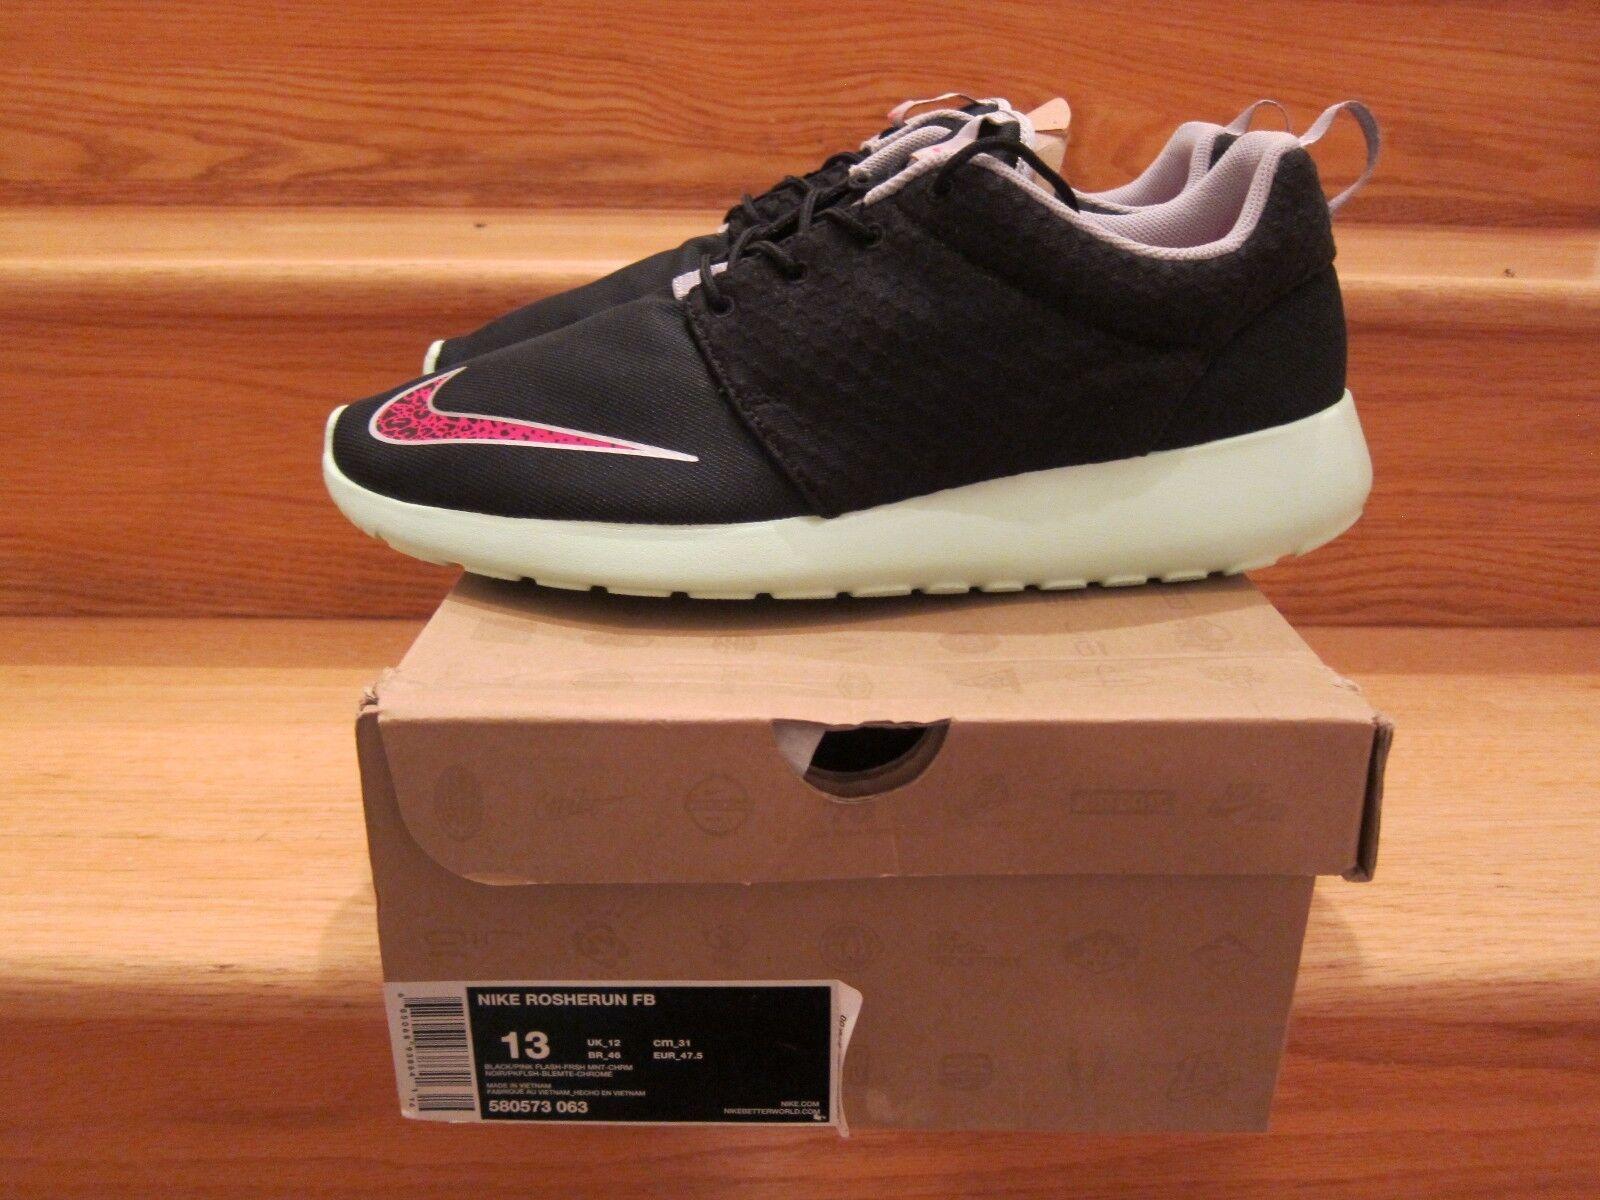 info for d402a ba6bc Nike Air rosherun FB FB FB Negro Rosa Flash tamaño 13 nuevos zapatos para  hombres y